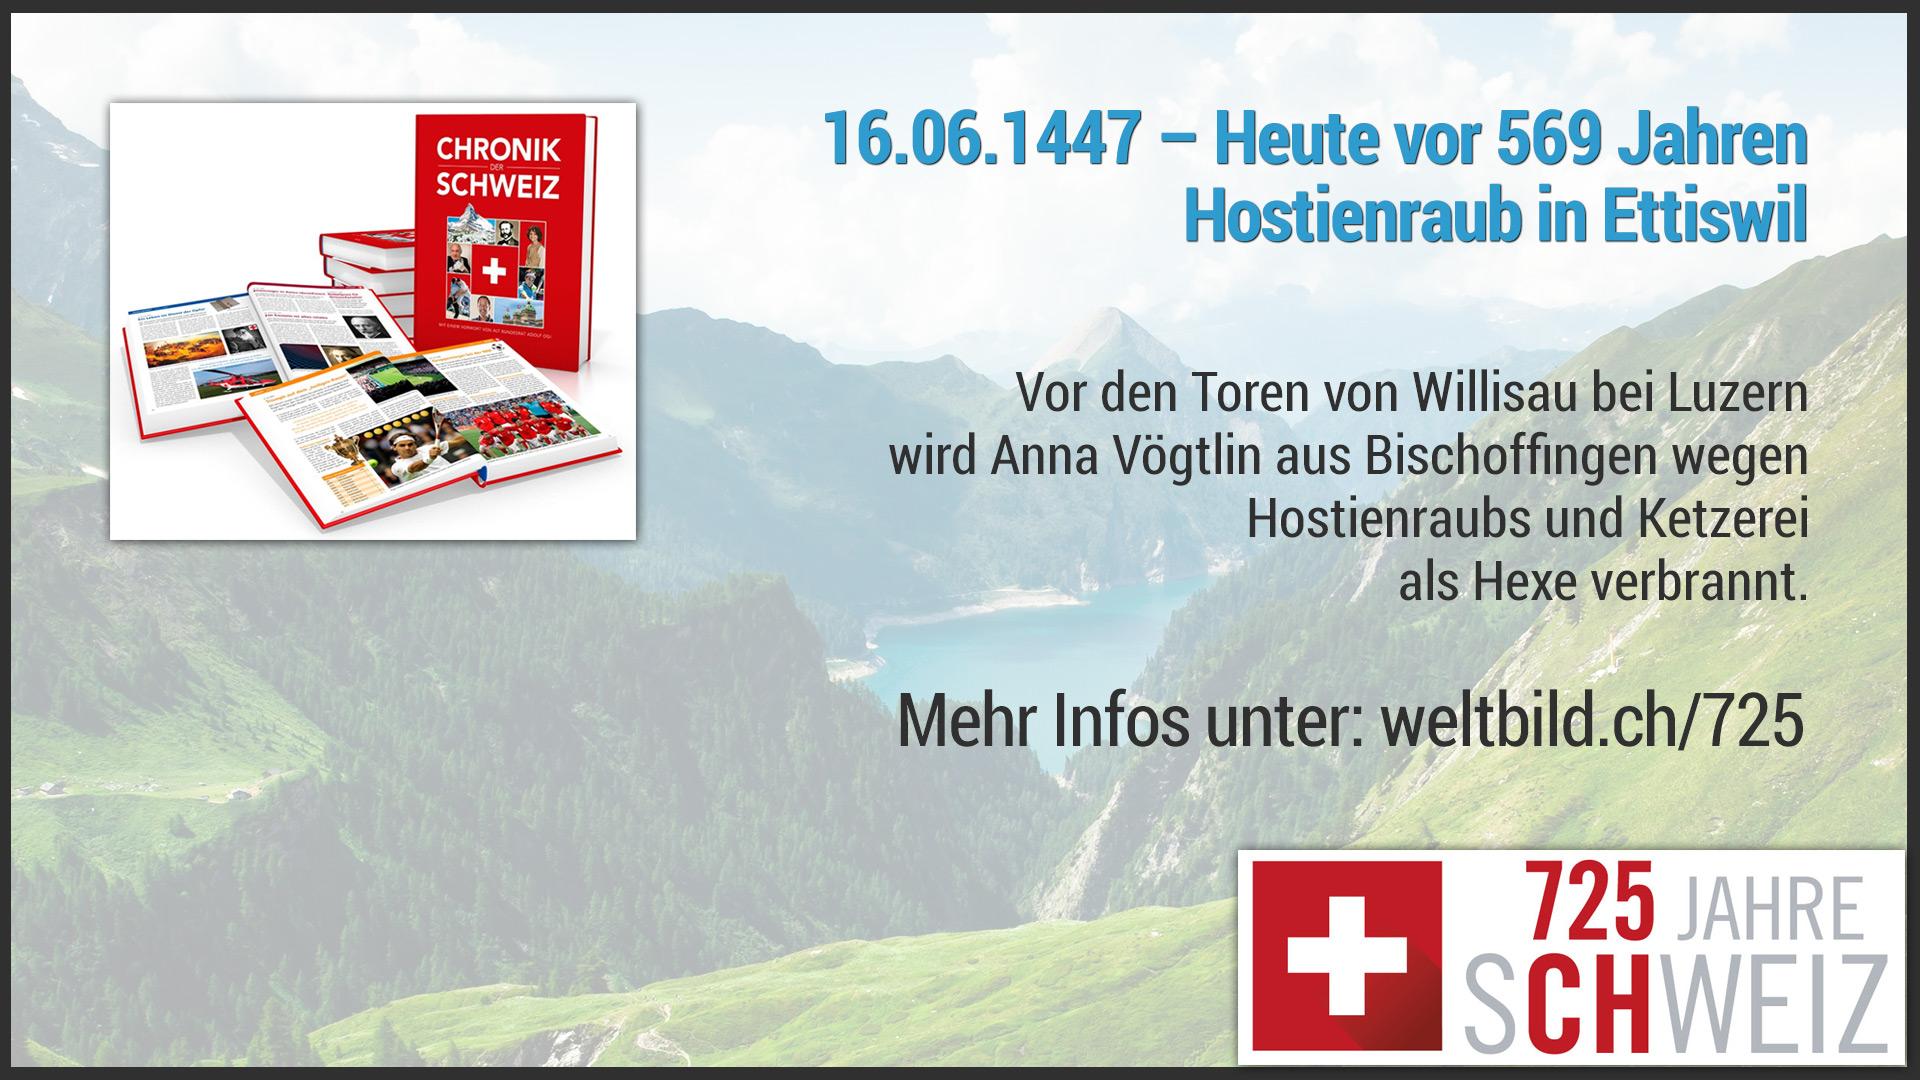 instore_160616_chronik-hostienraub01_ch